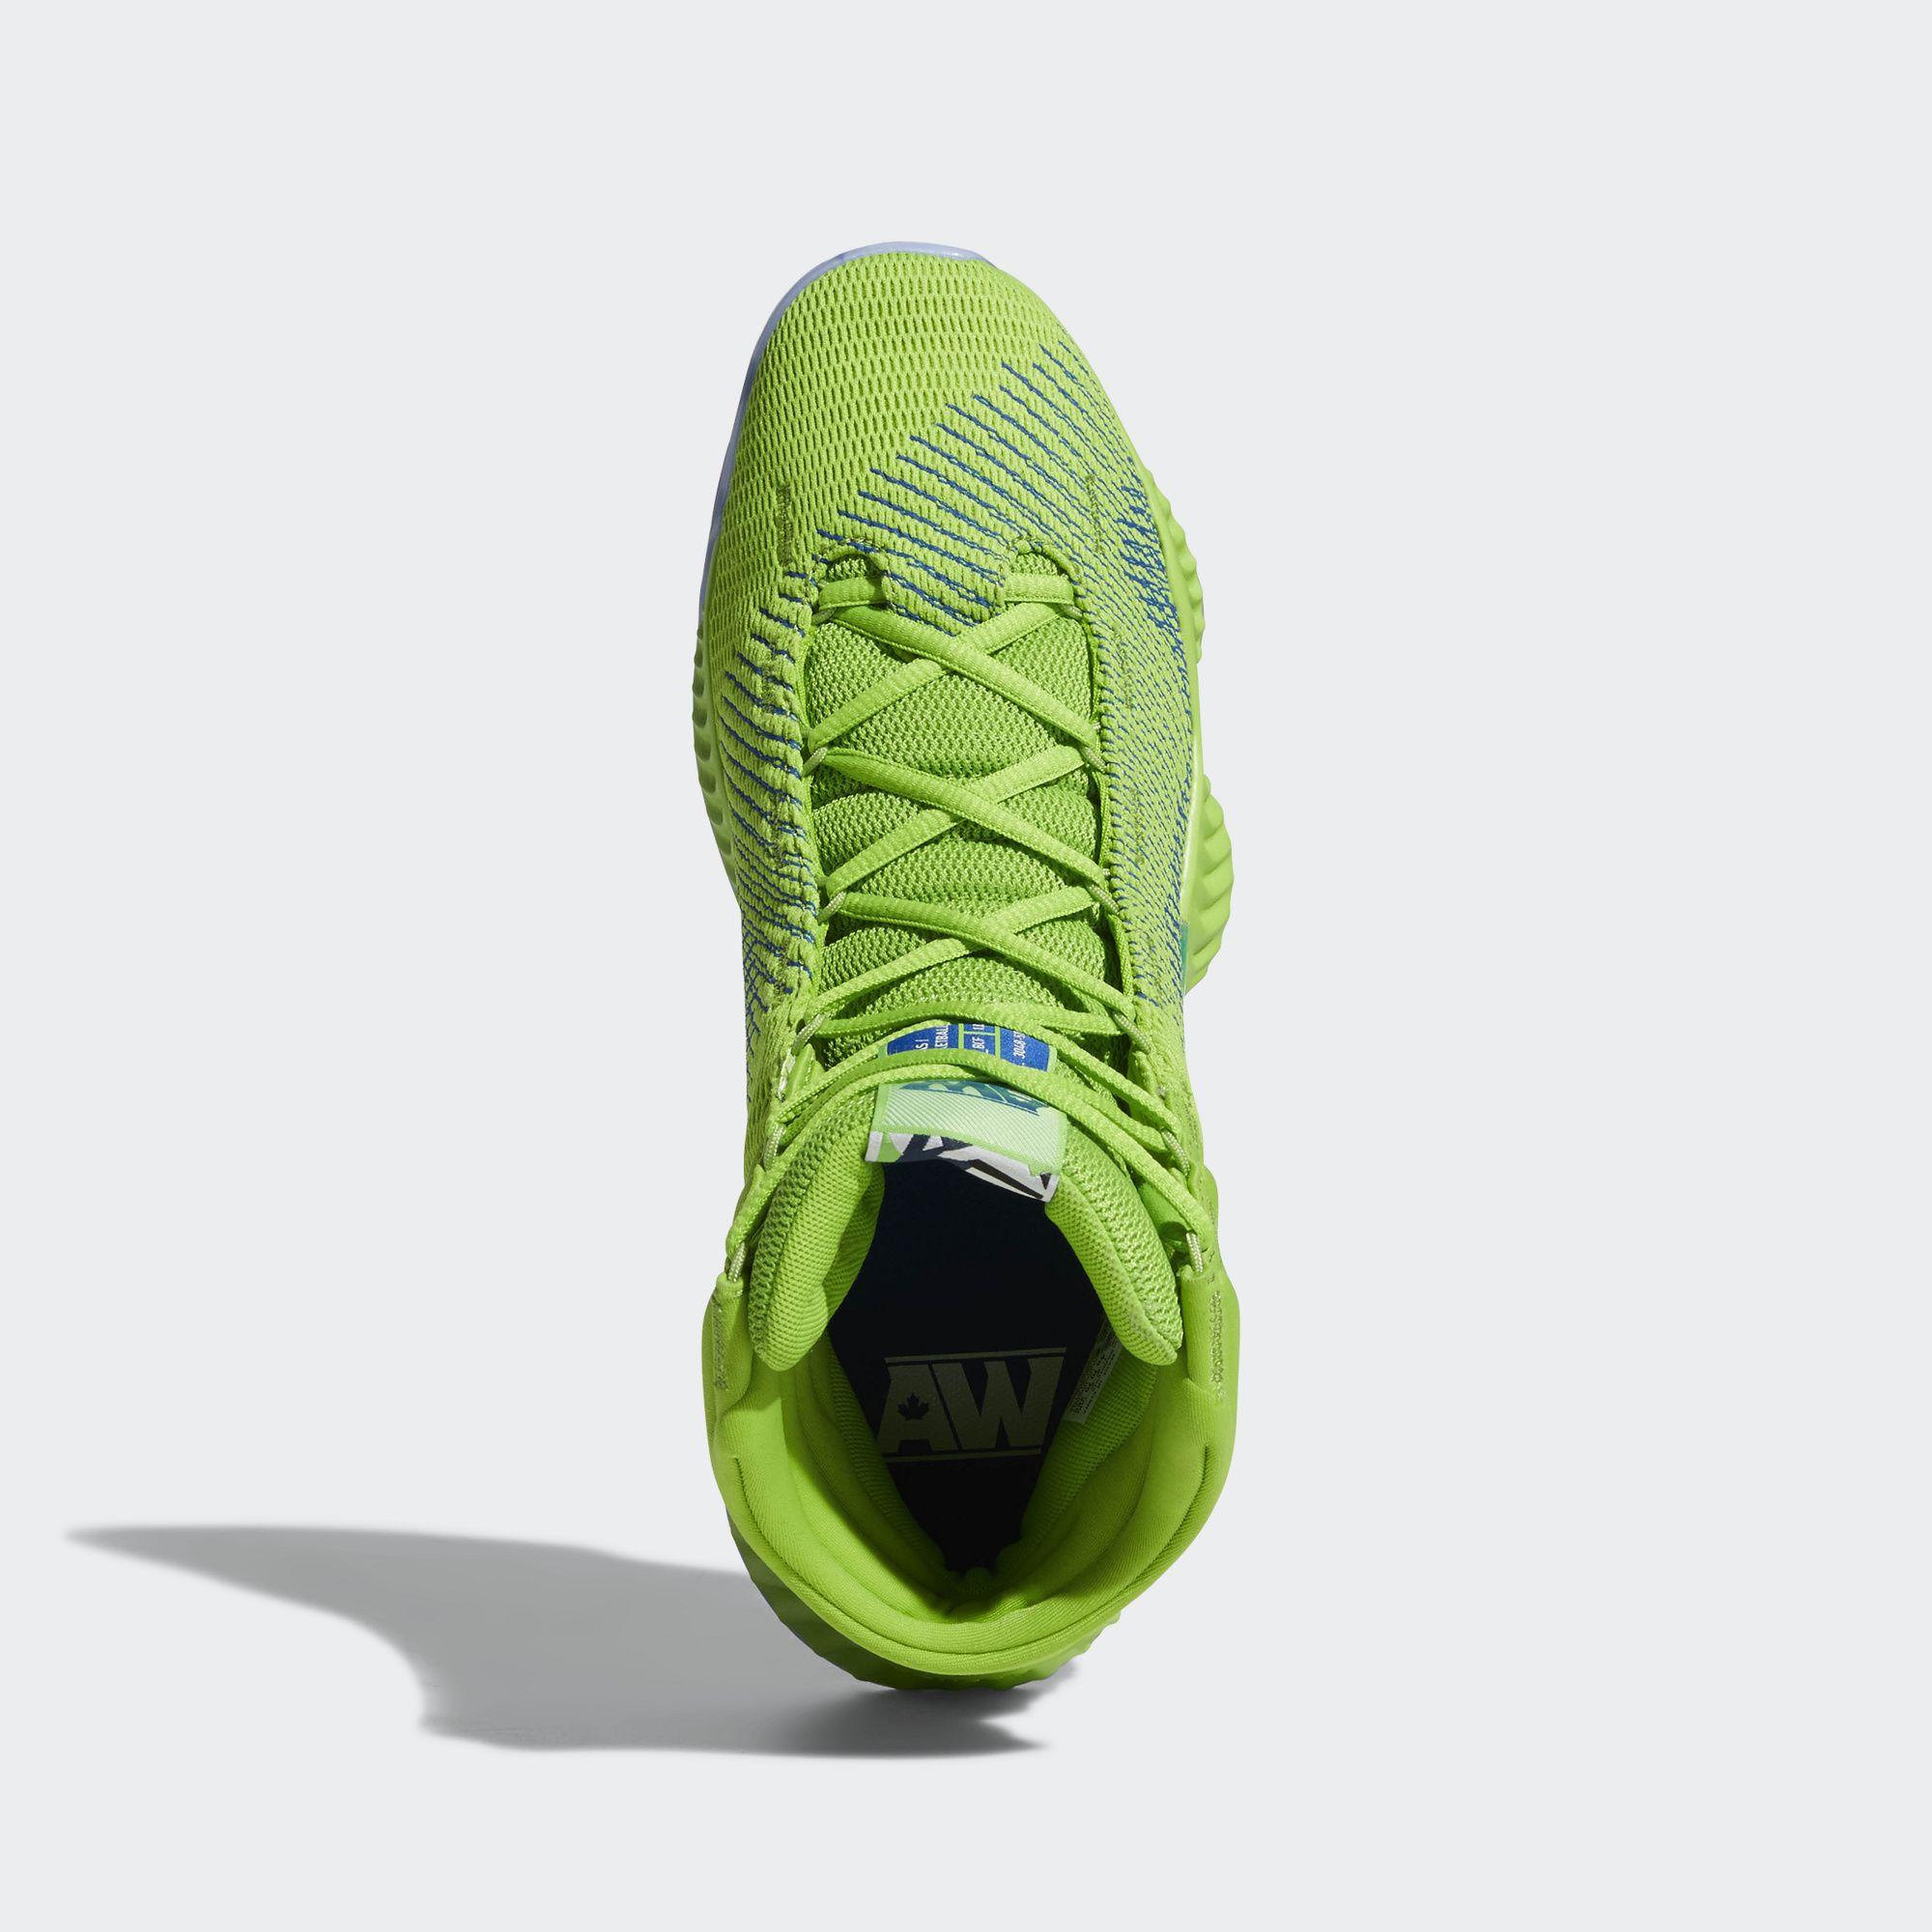 cc334c2c81ae0 adidas Pro Bounce 2018 Andrew Wiggins PE 4 - WearTesters